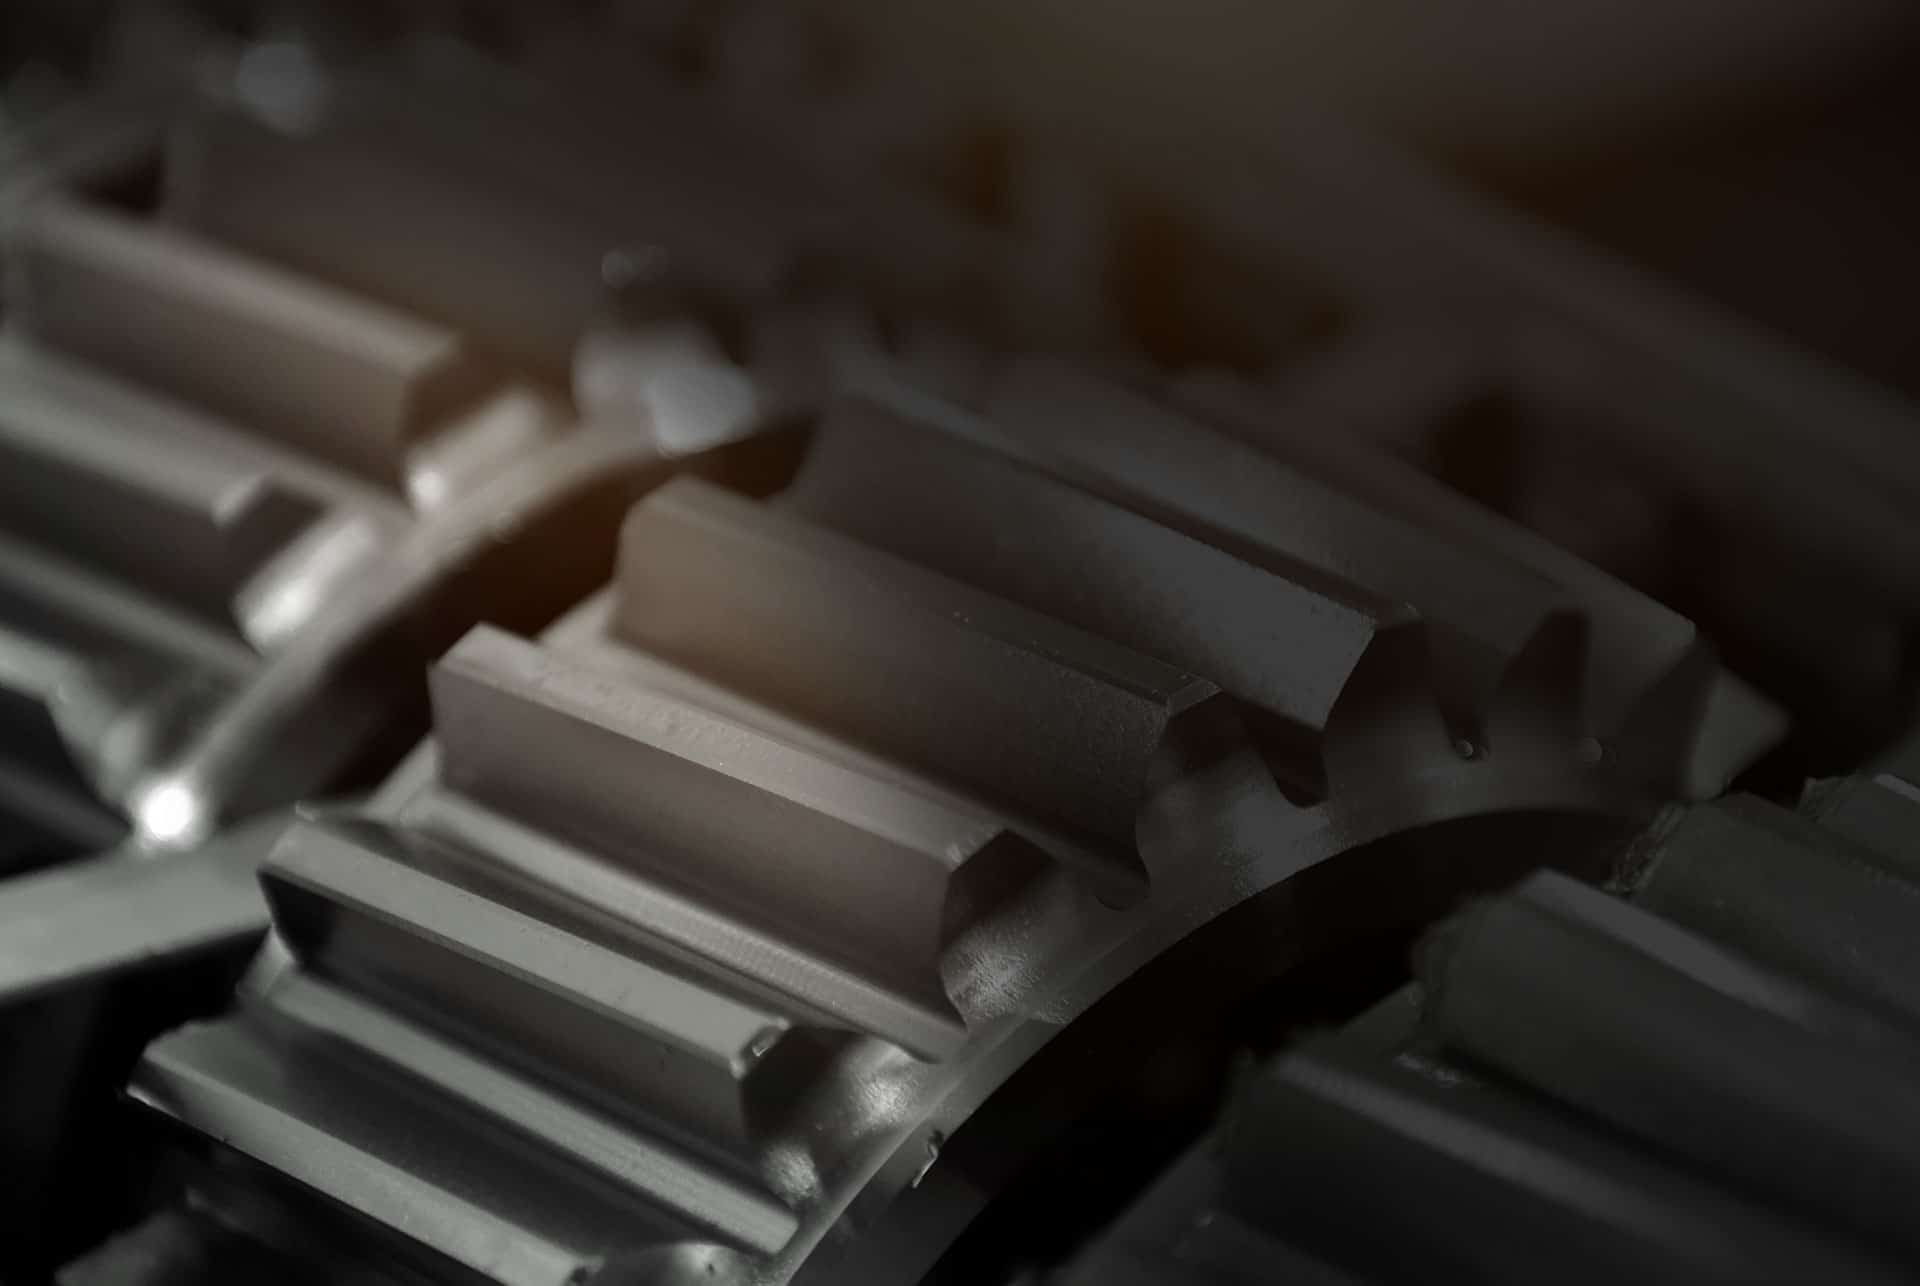 تعمیر گیربکس اتوماتیک - گیربکس کار